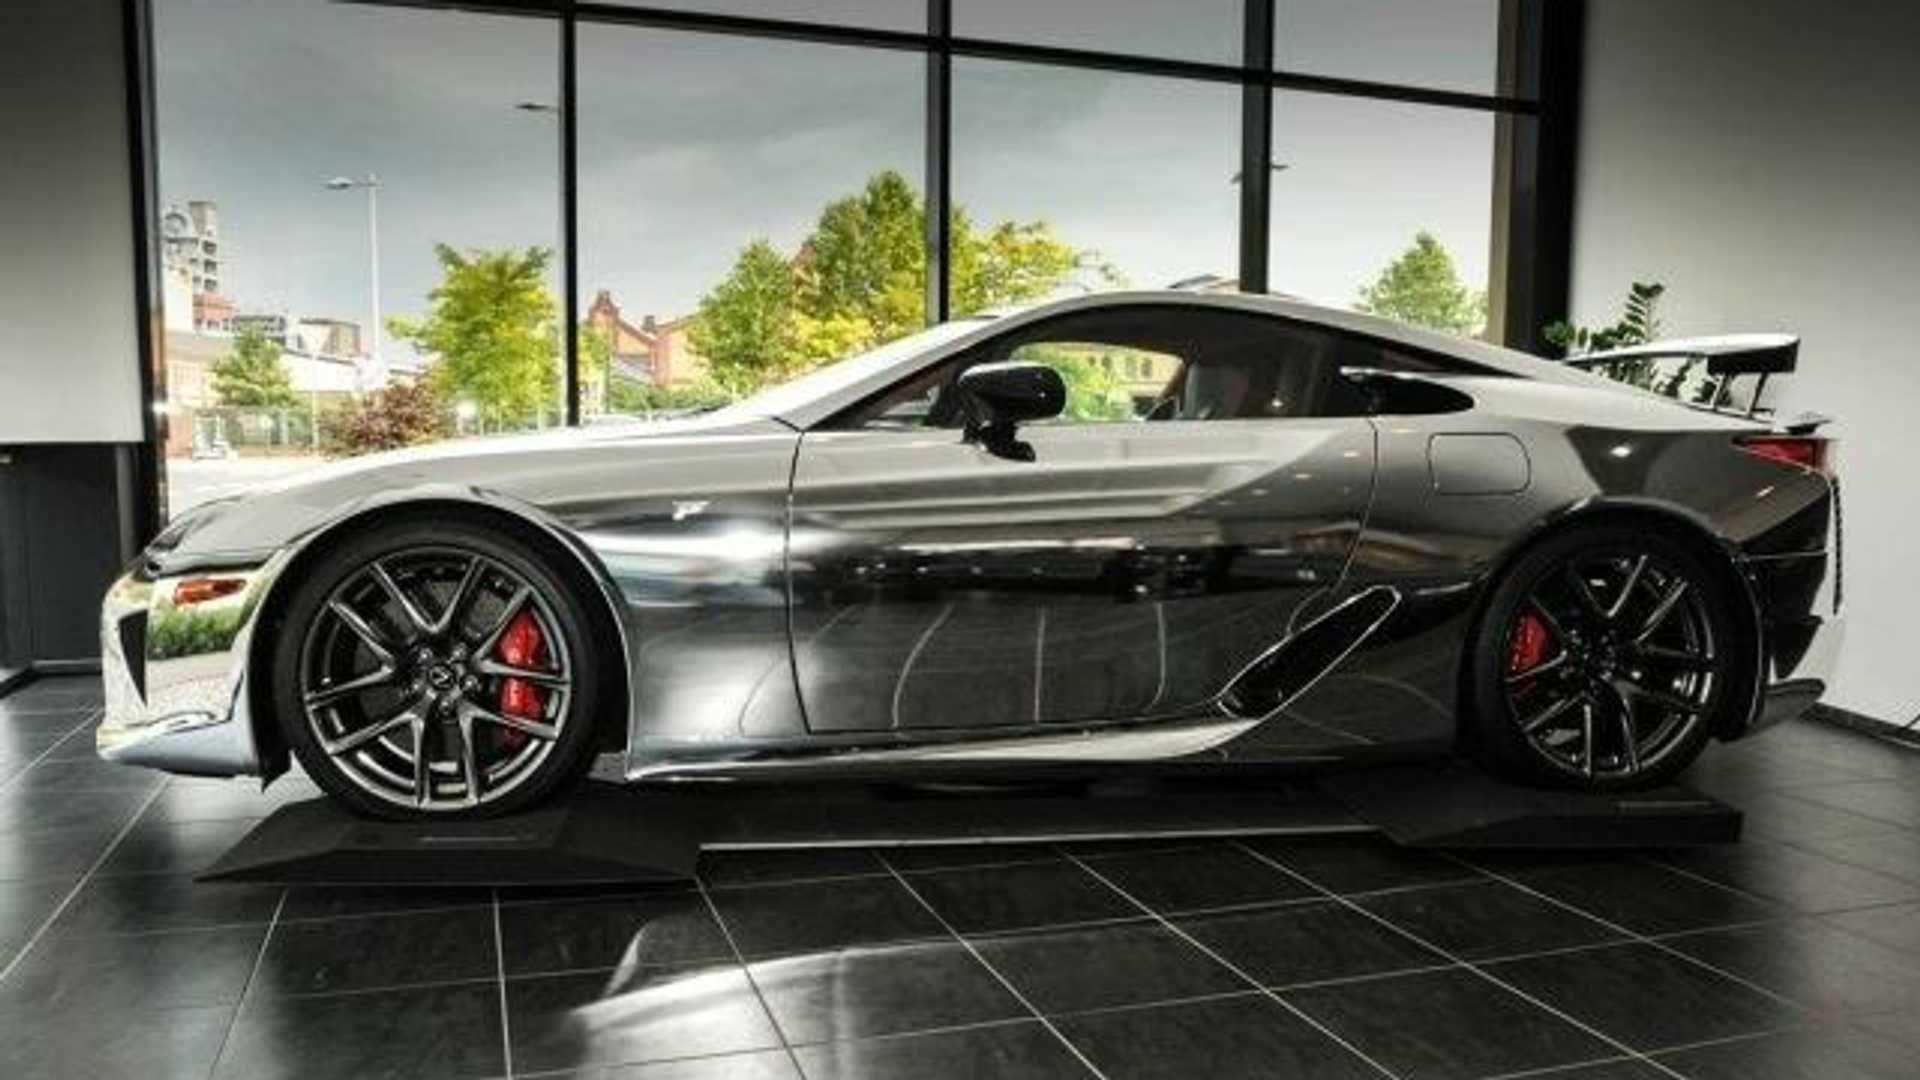 Mobil Sport Lexus Lfa Tampil Menawan Seluruh Bodi Berbalut Chrome Lexus Lfa Mobil Sport Kabin